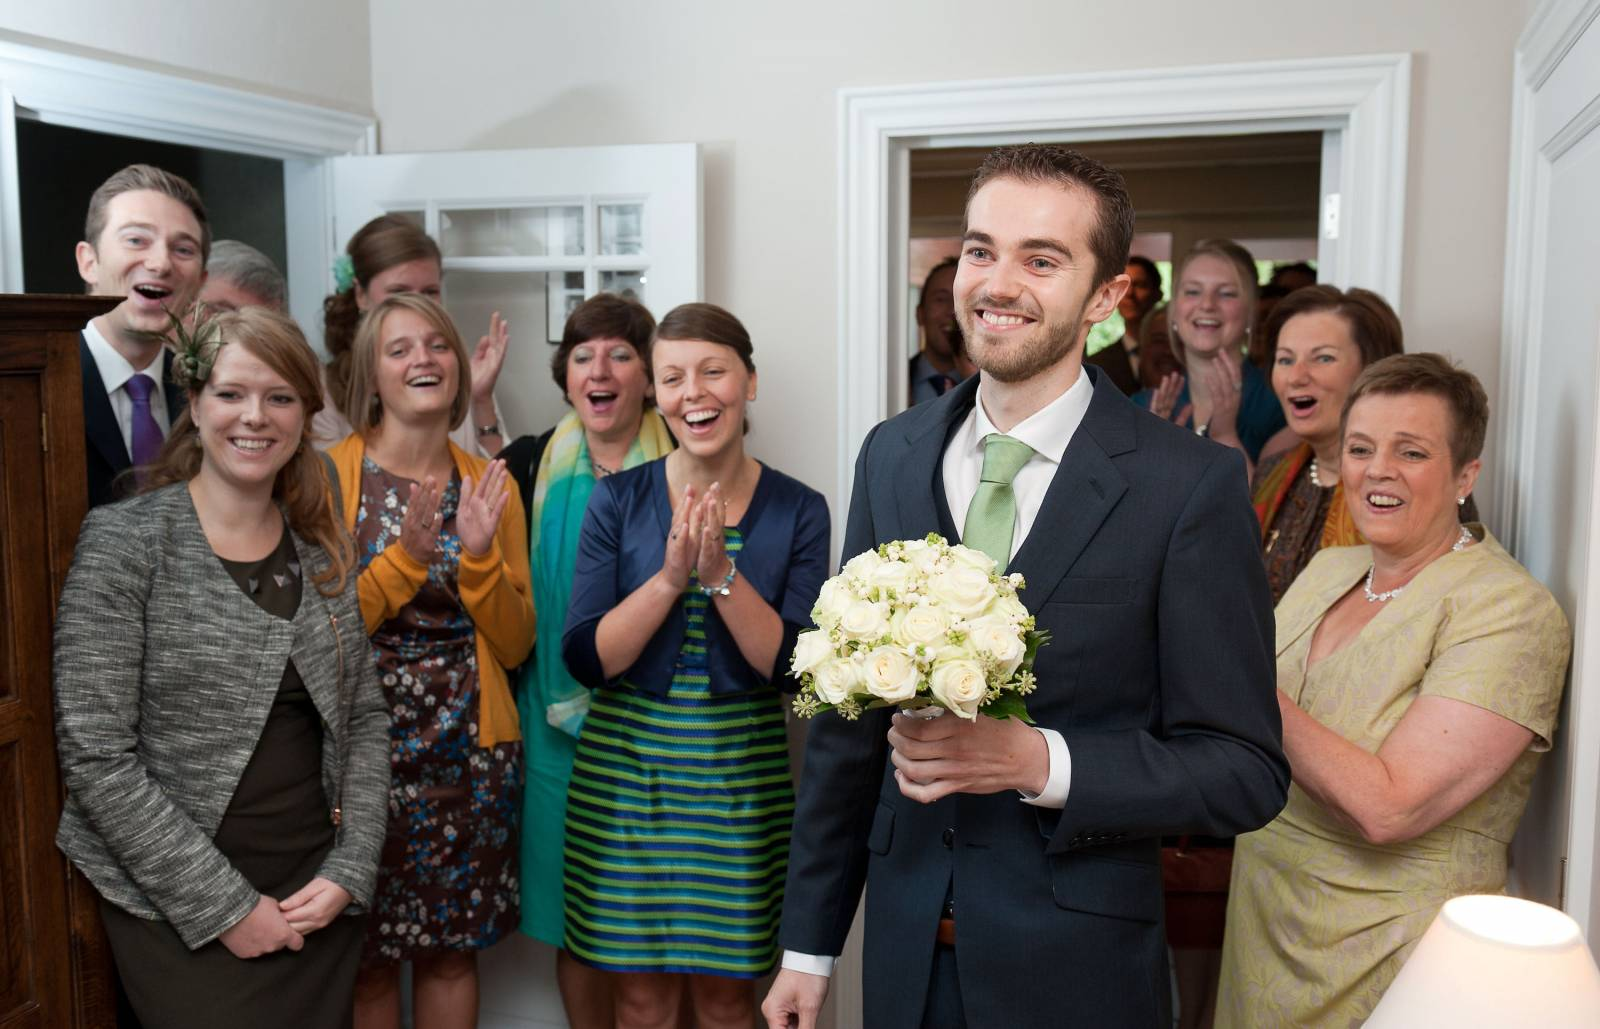 Foto Meeuw - House of Weddings - 9